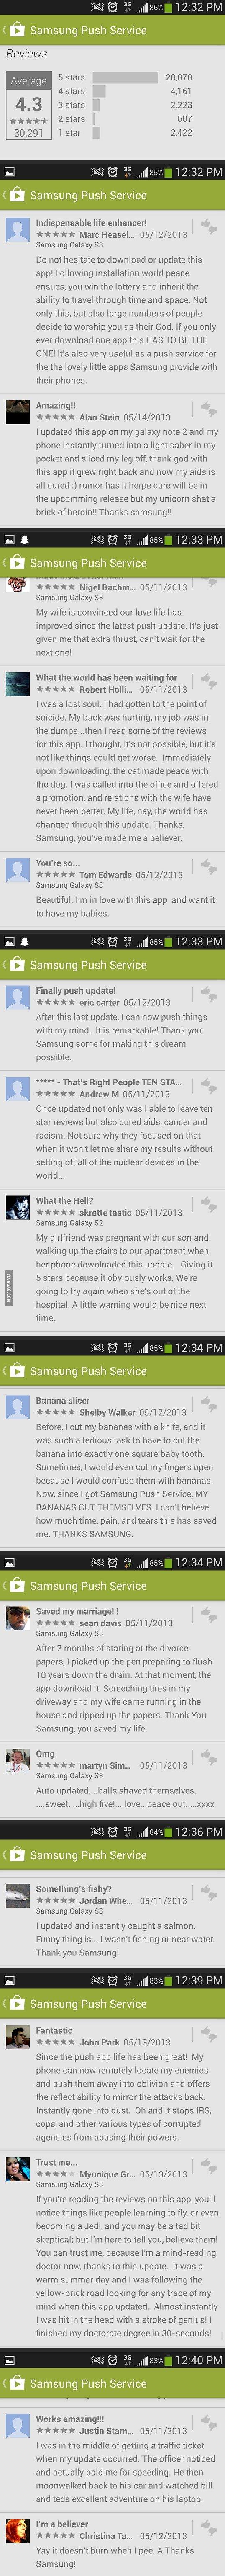 Samsung Push Services Reviews